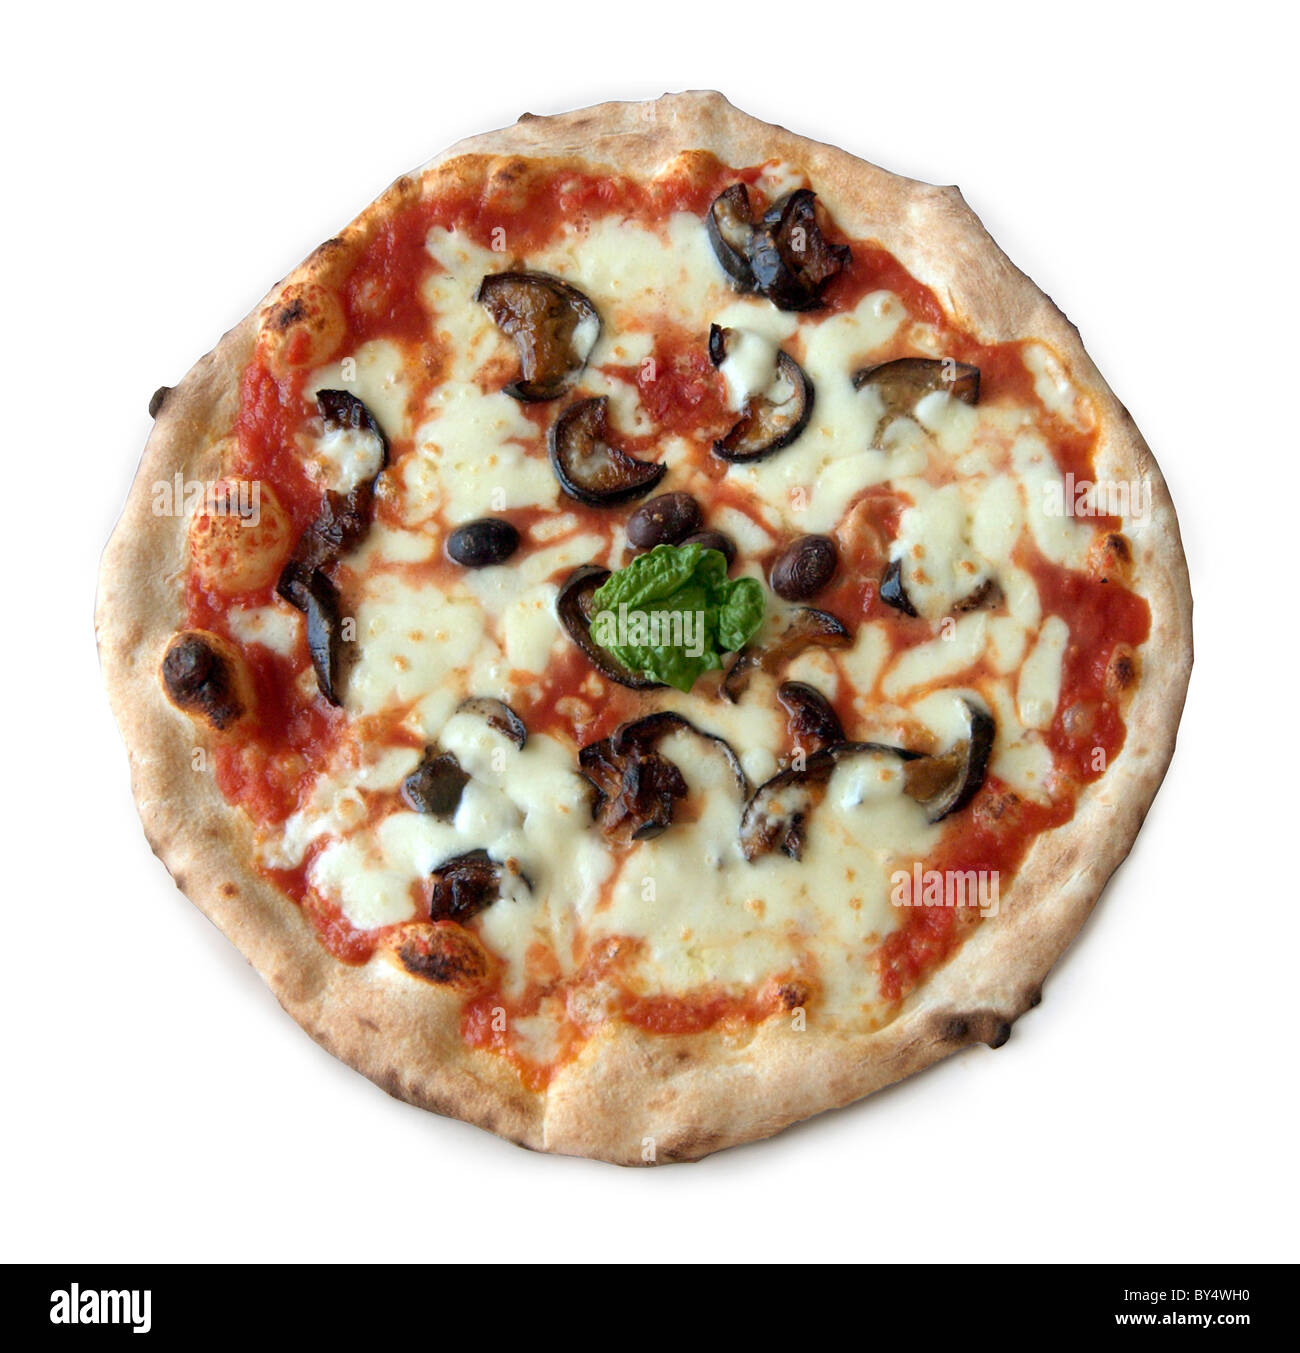 Horno tradicional Pizza, Italia Imagen De Stock